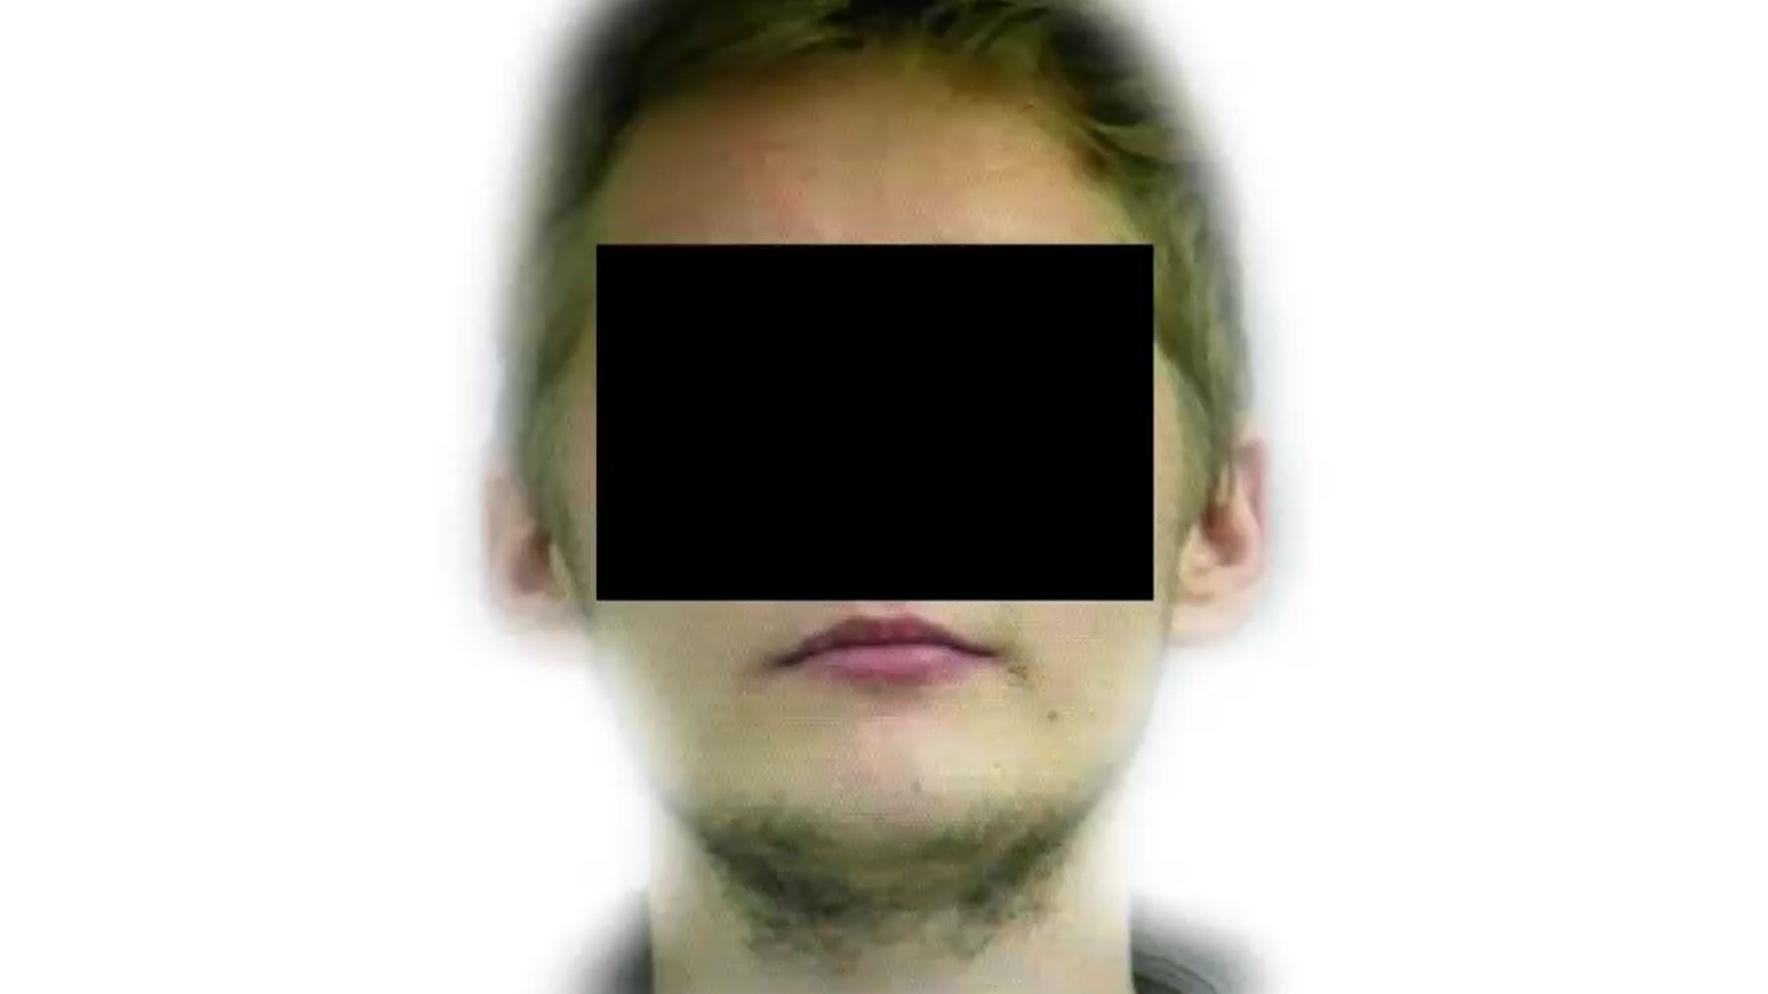 Volkmarsen (Hessen): In Karnevalsumzug gerast: Tatverdächtiger Maurice P. (29) in Psycho-Klinik